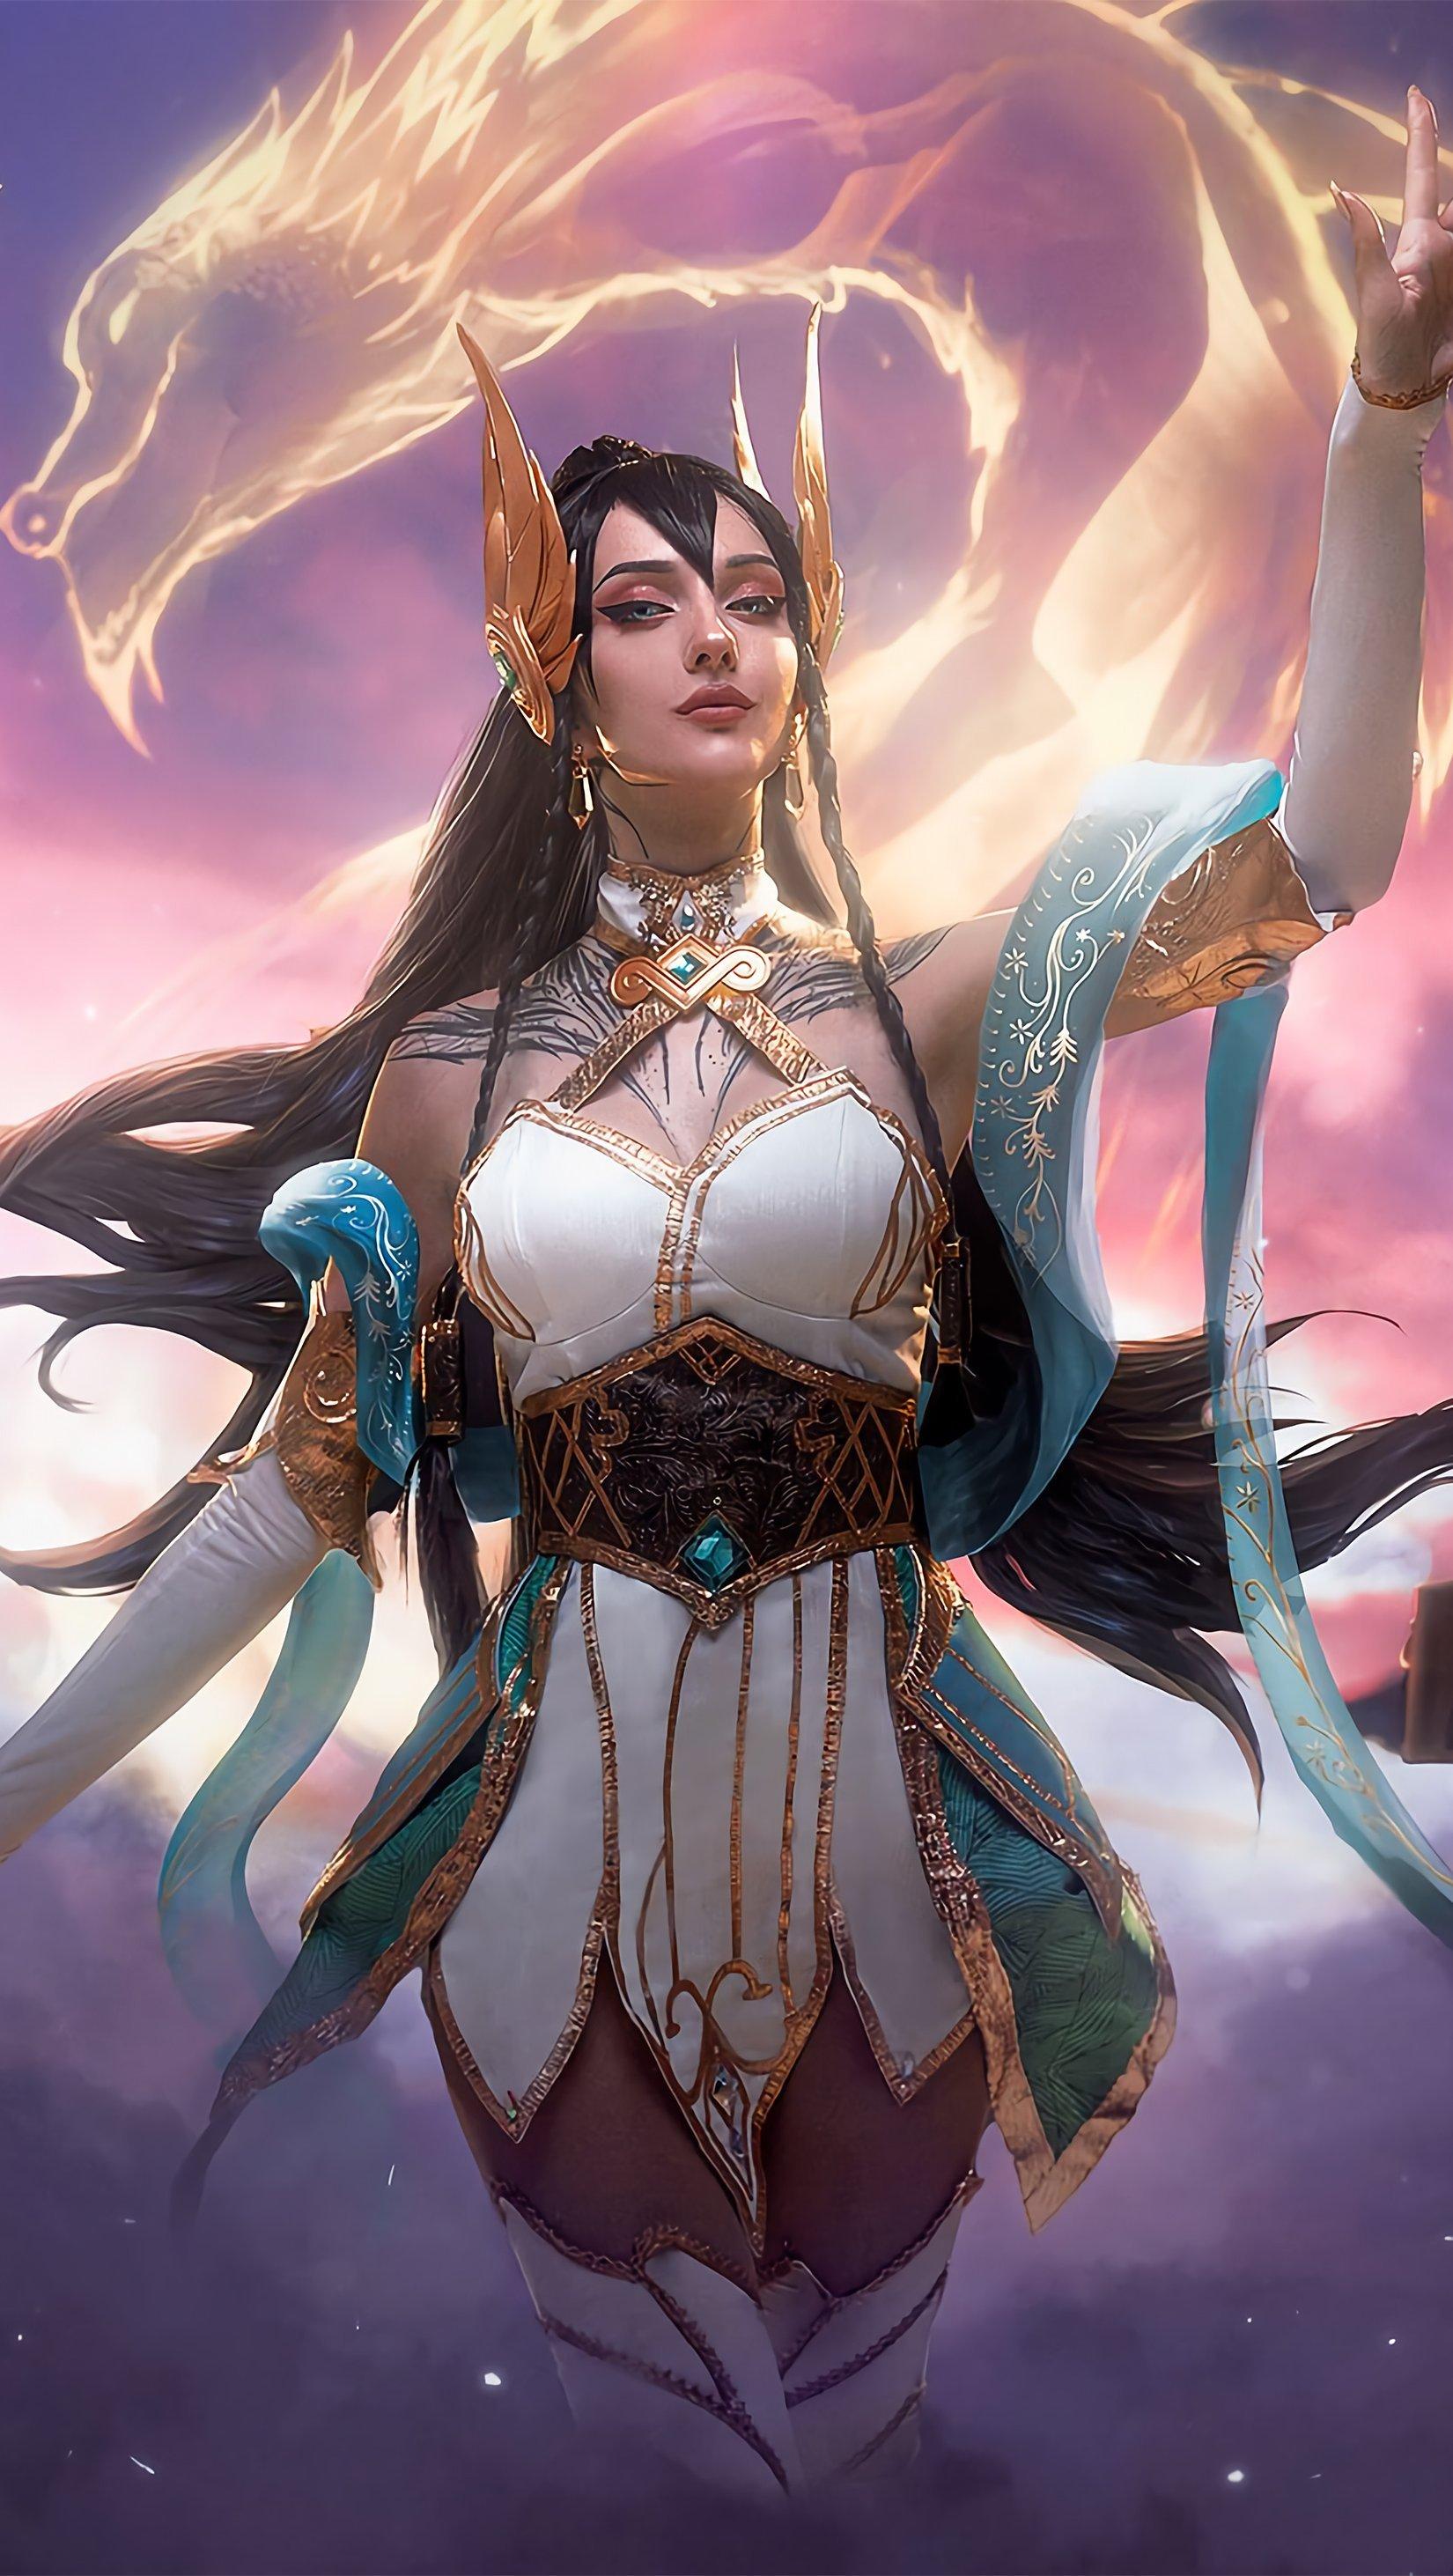 Fondos de pantalla Irelia League of Legends Arte Digital Vertical